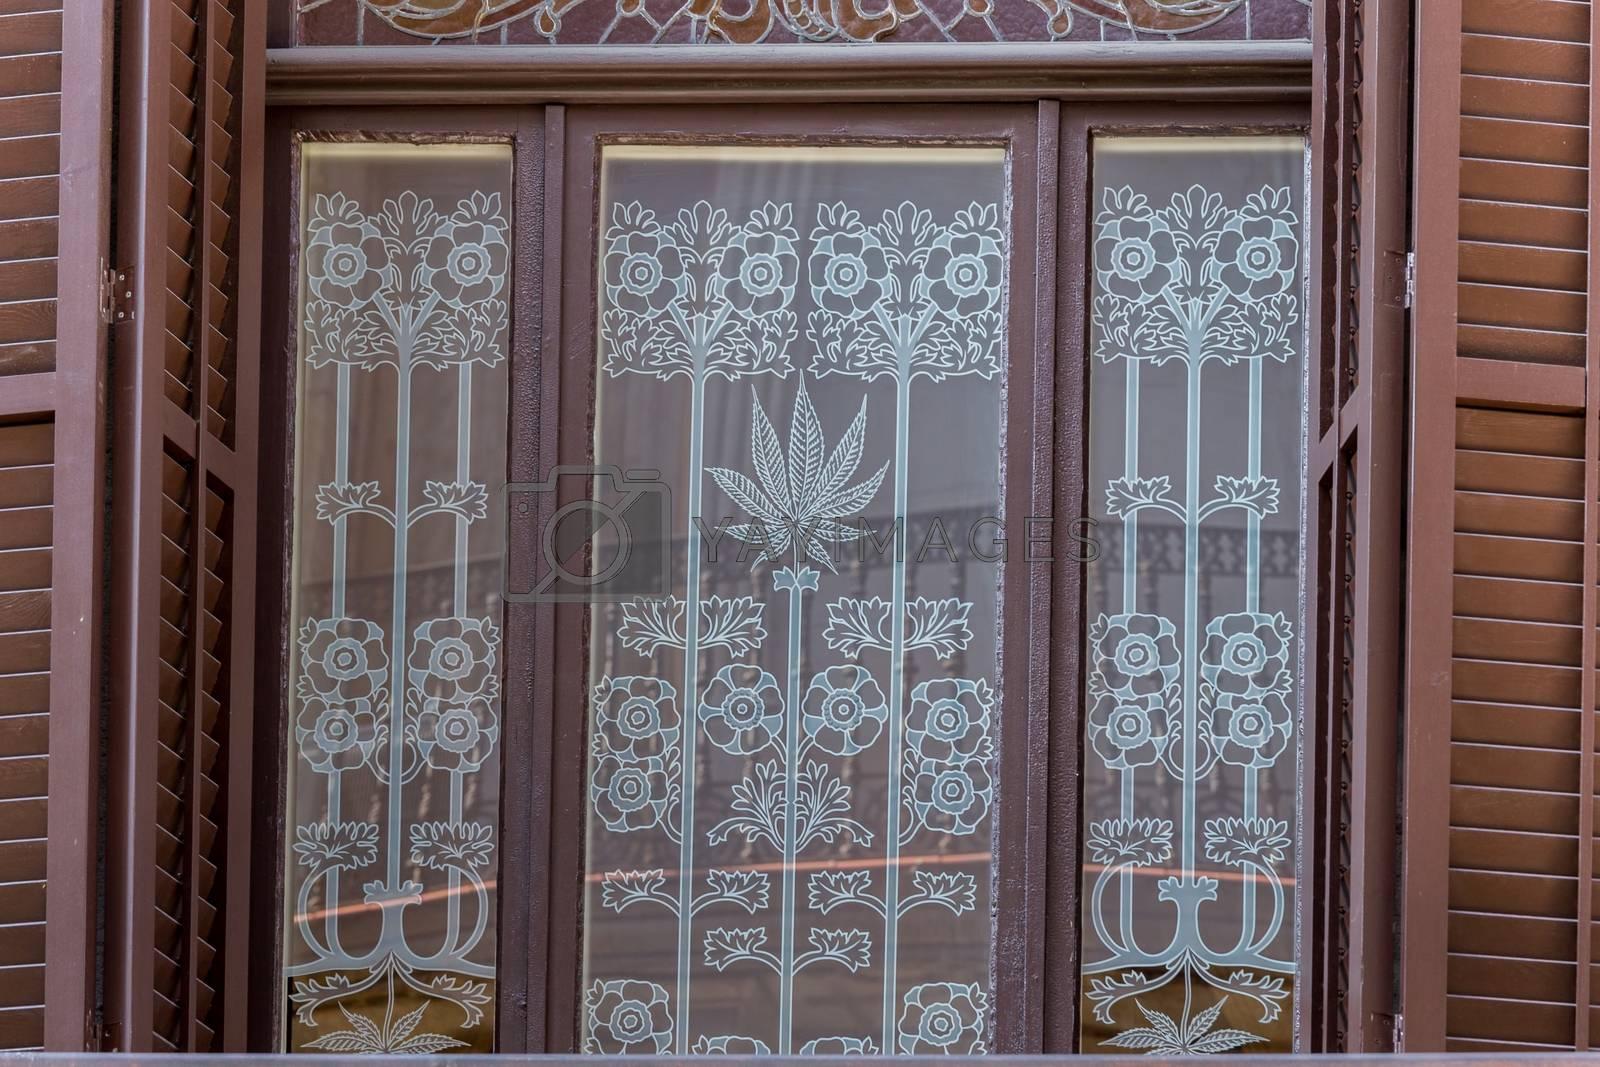 Palau Mornau, Hash Marihuana and Hemp Museum, Barcelona, Ciutat Vella, Spain